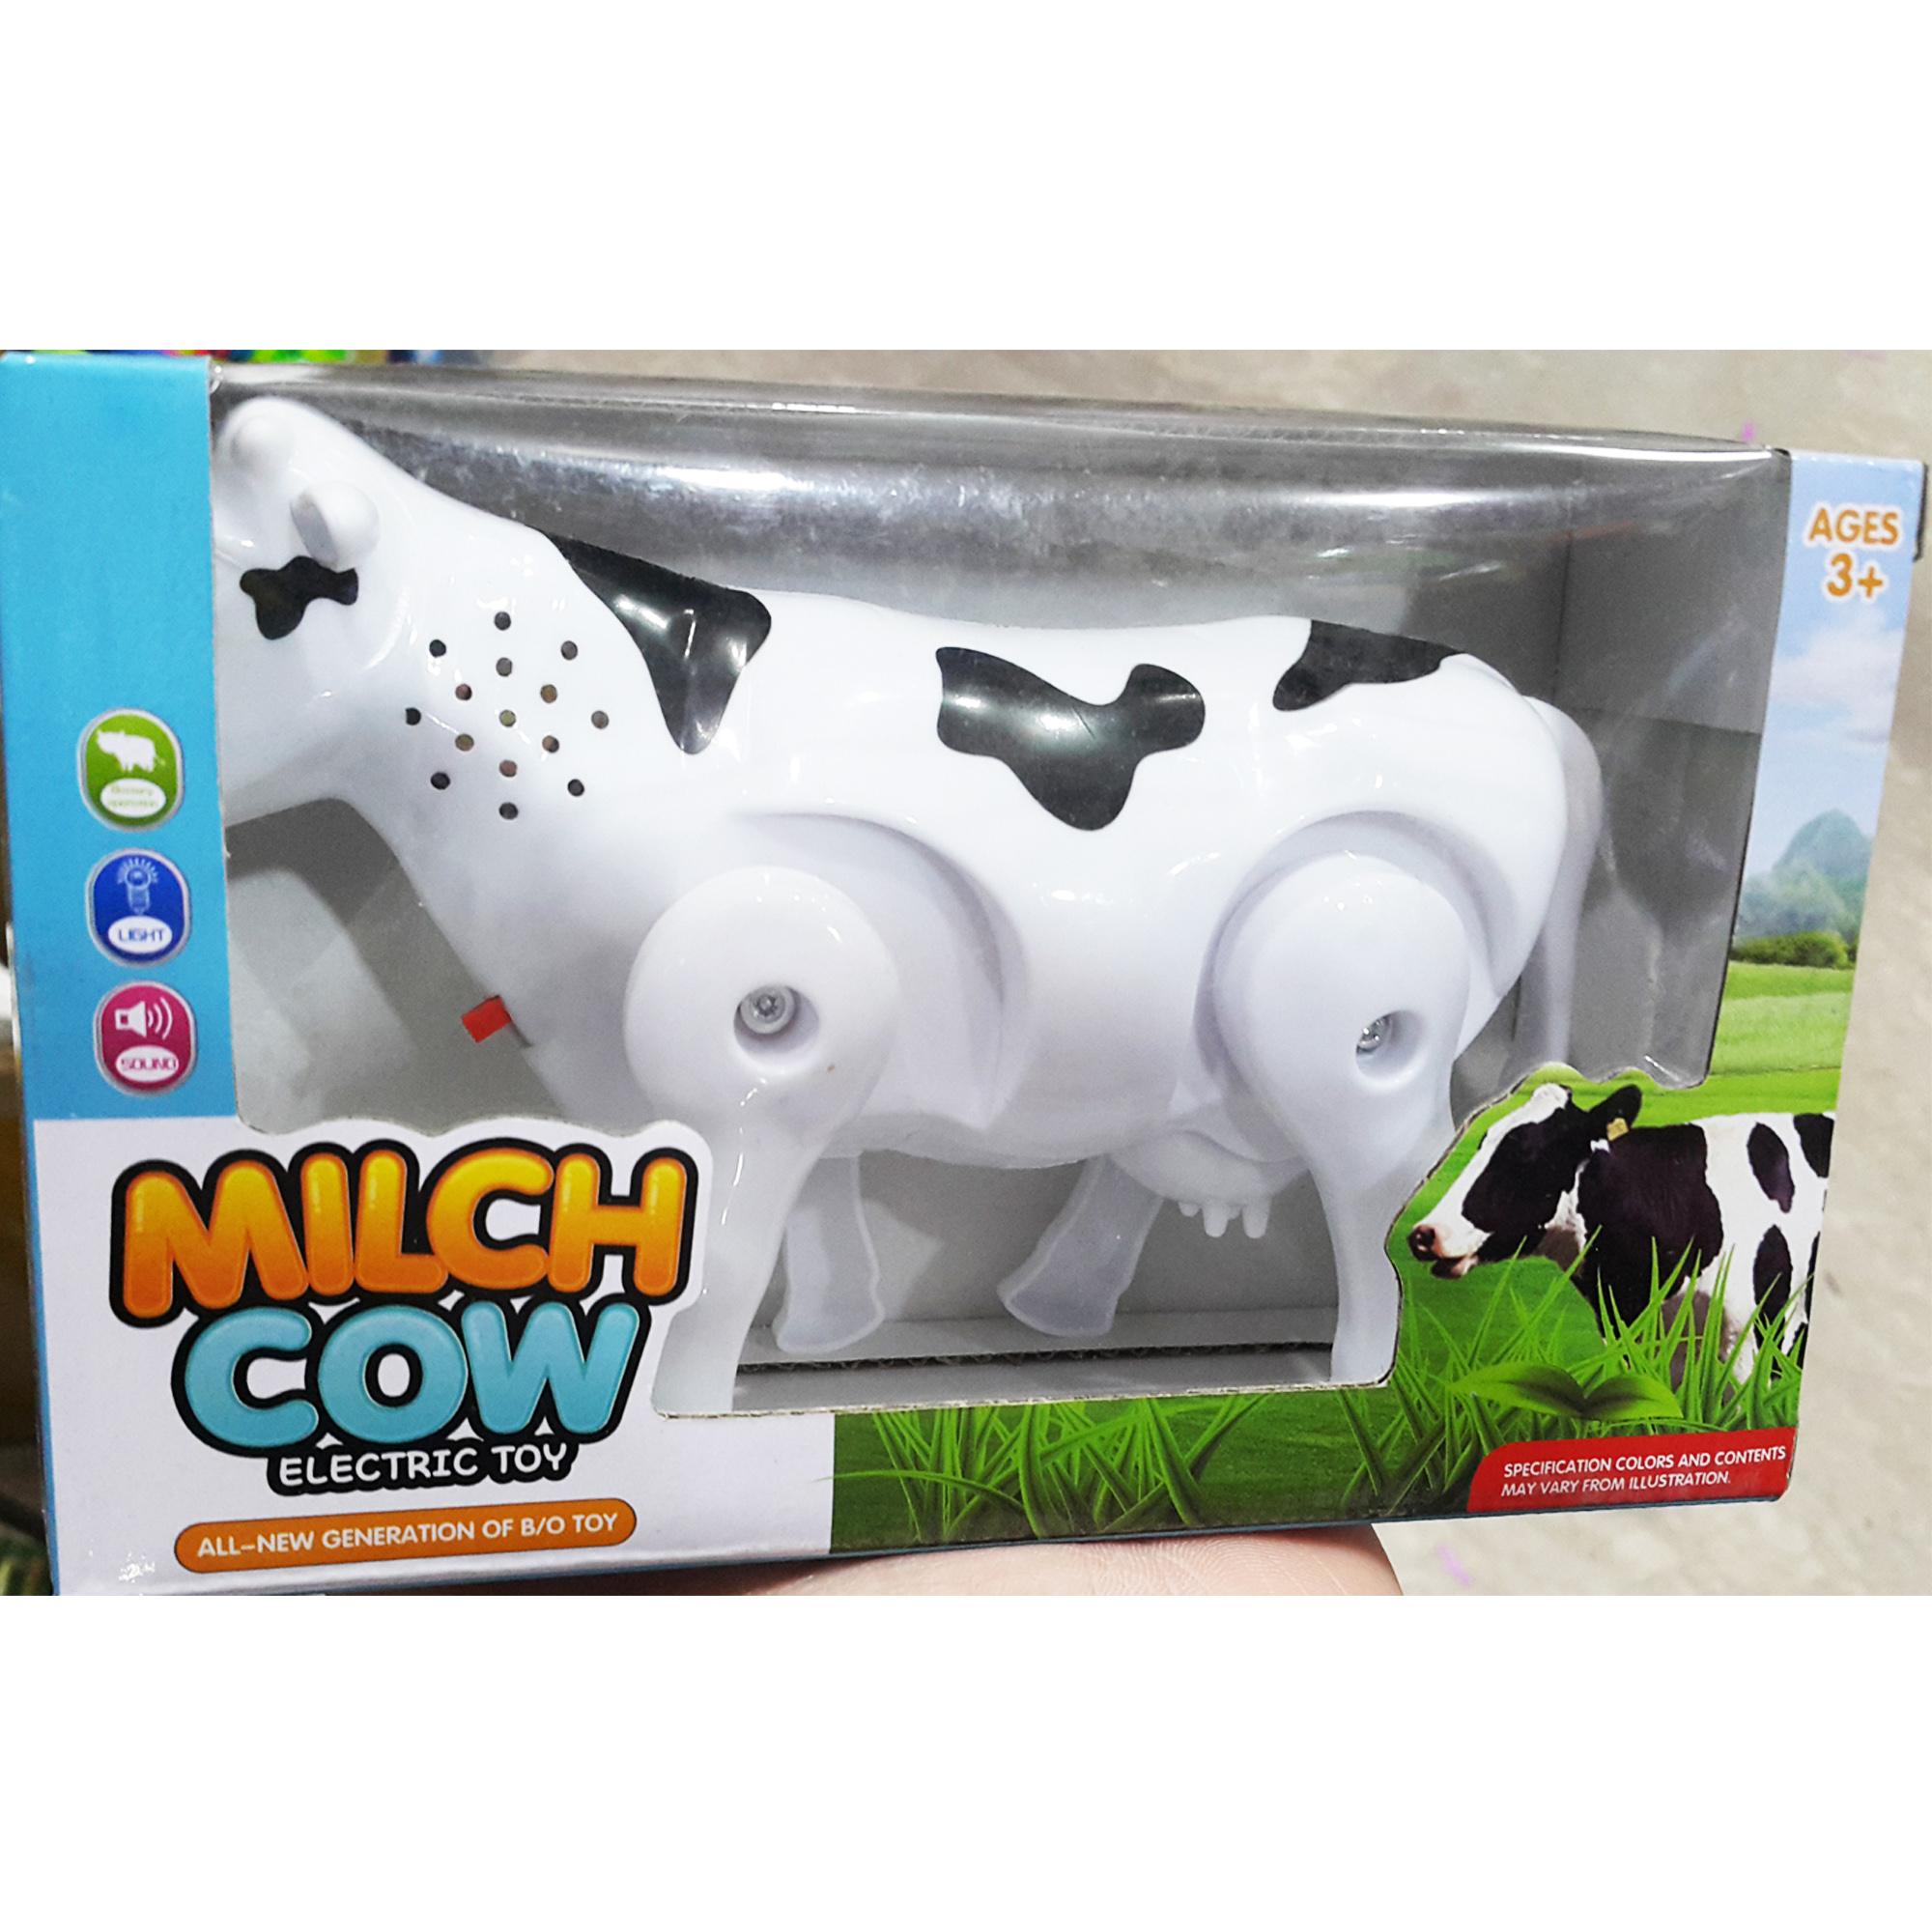 Musical & Lighting Funny Walking Milk Cow Toy - White & Black